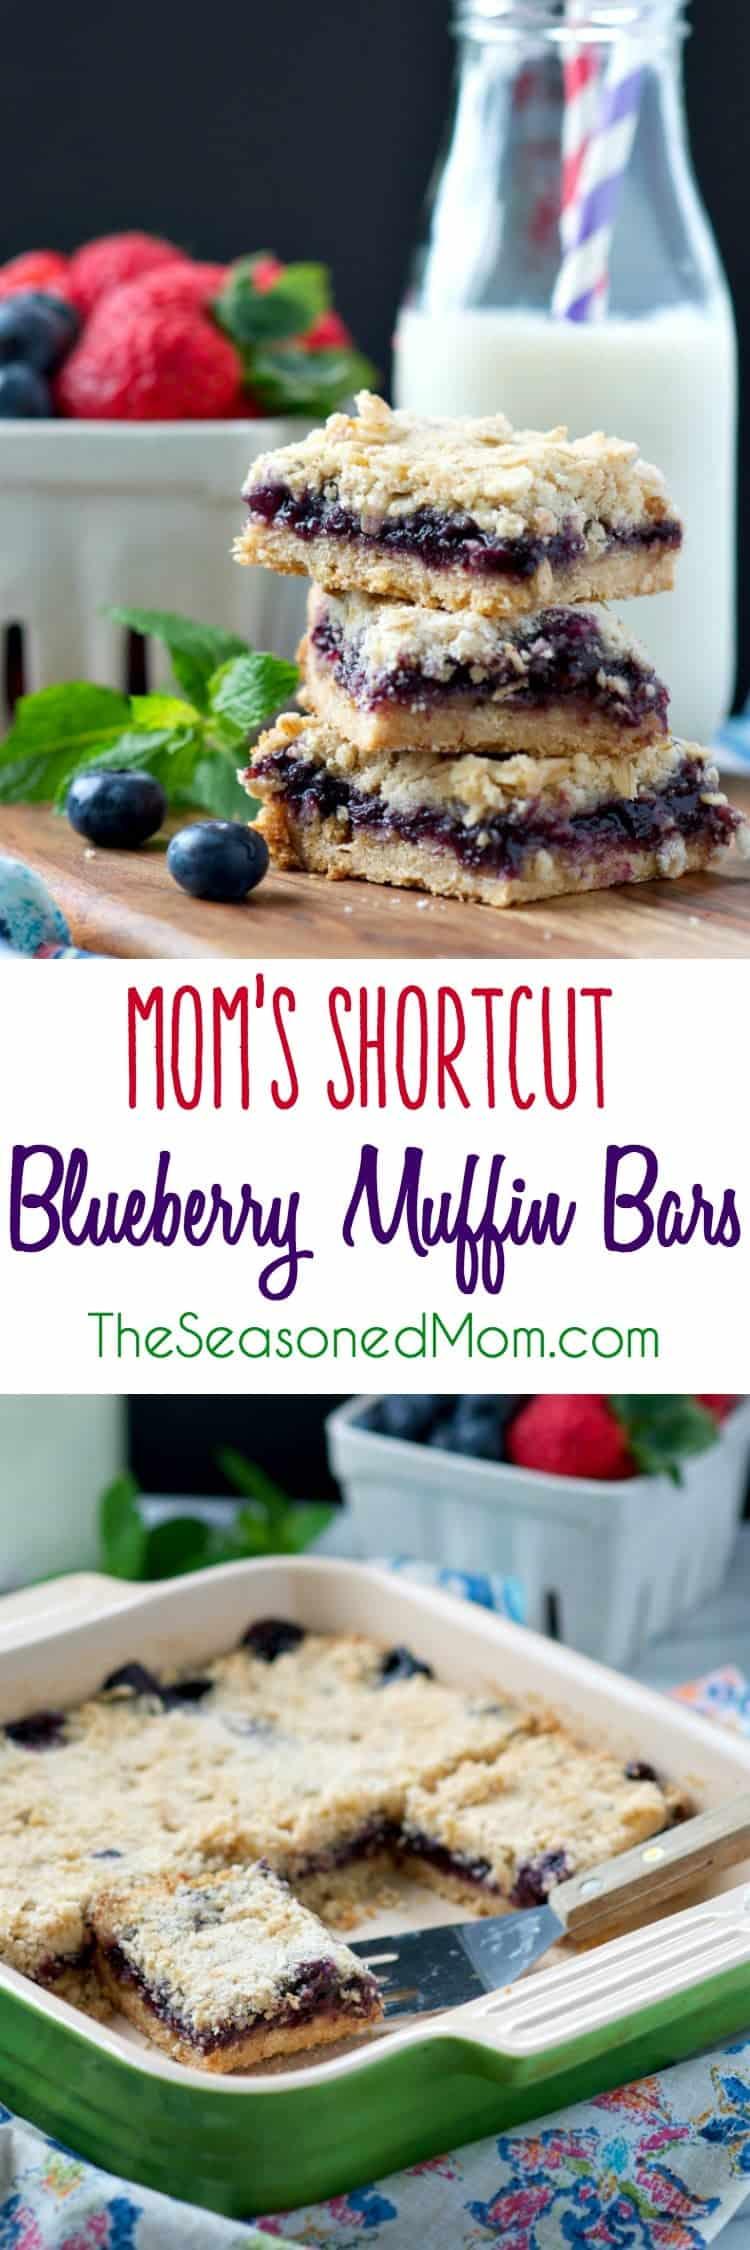 Mom's Shortcut Blueberry Muffin Bars - The Seasoned Mom